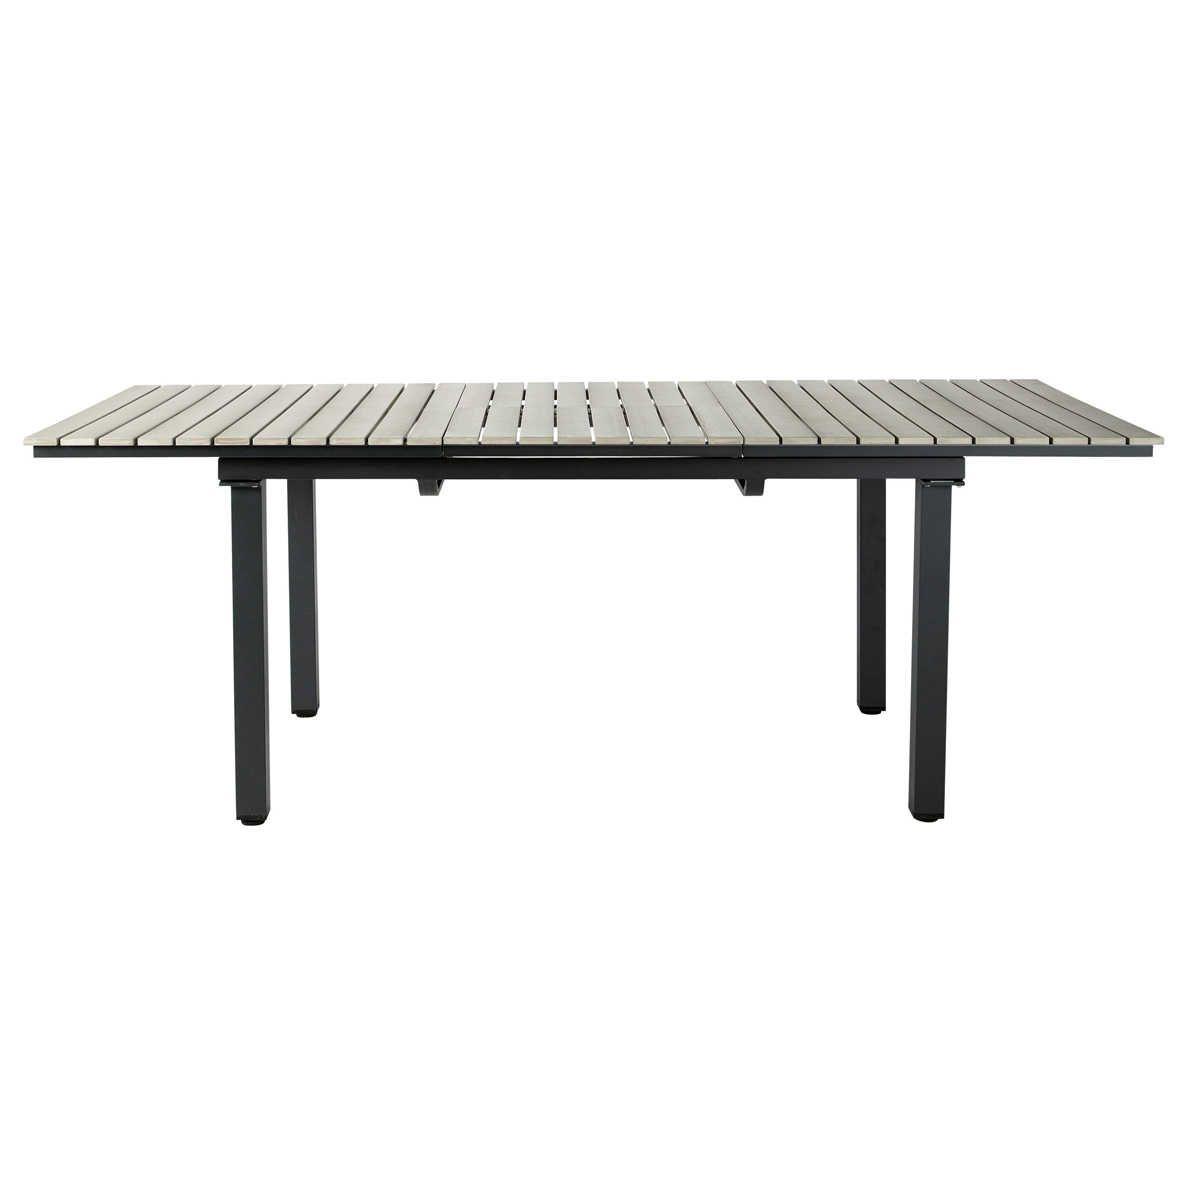 Gartentisch aus Plastik in Holzoptik und Aluminium, B 213 cm, grau ...